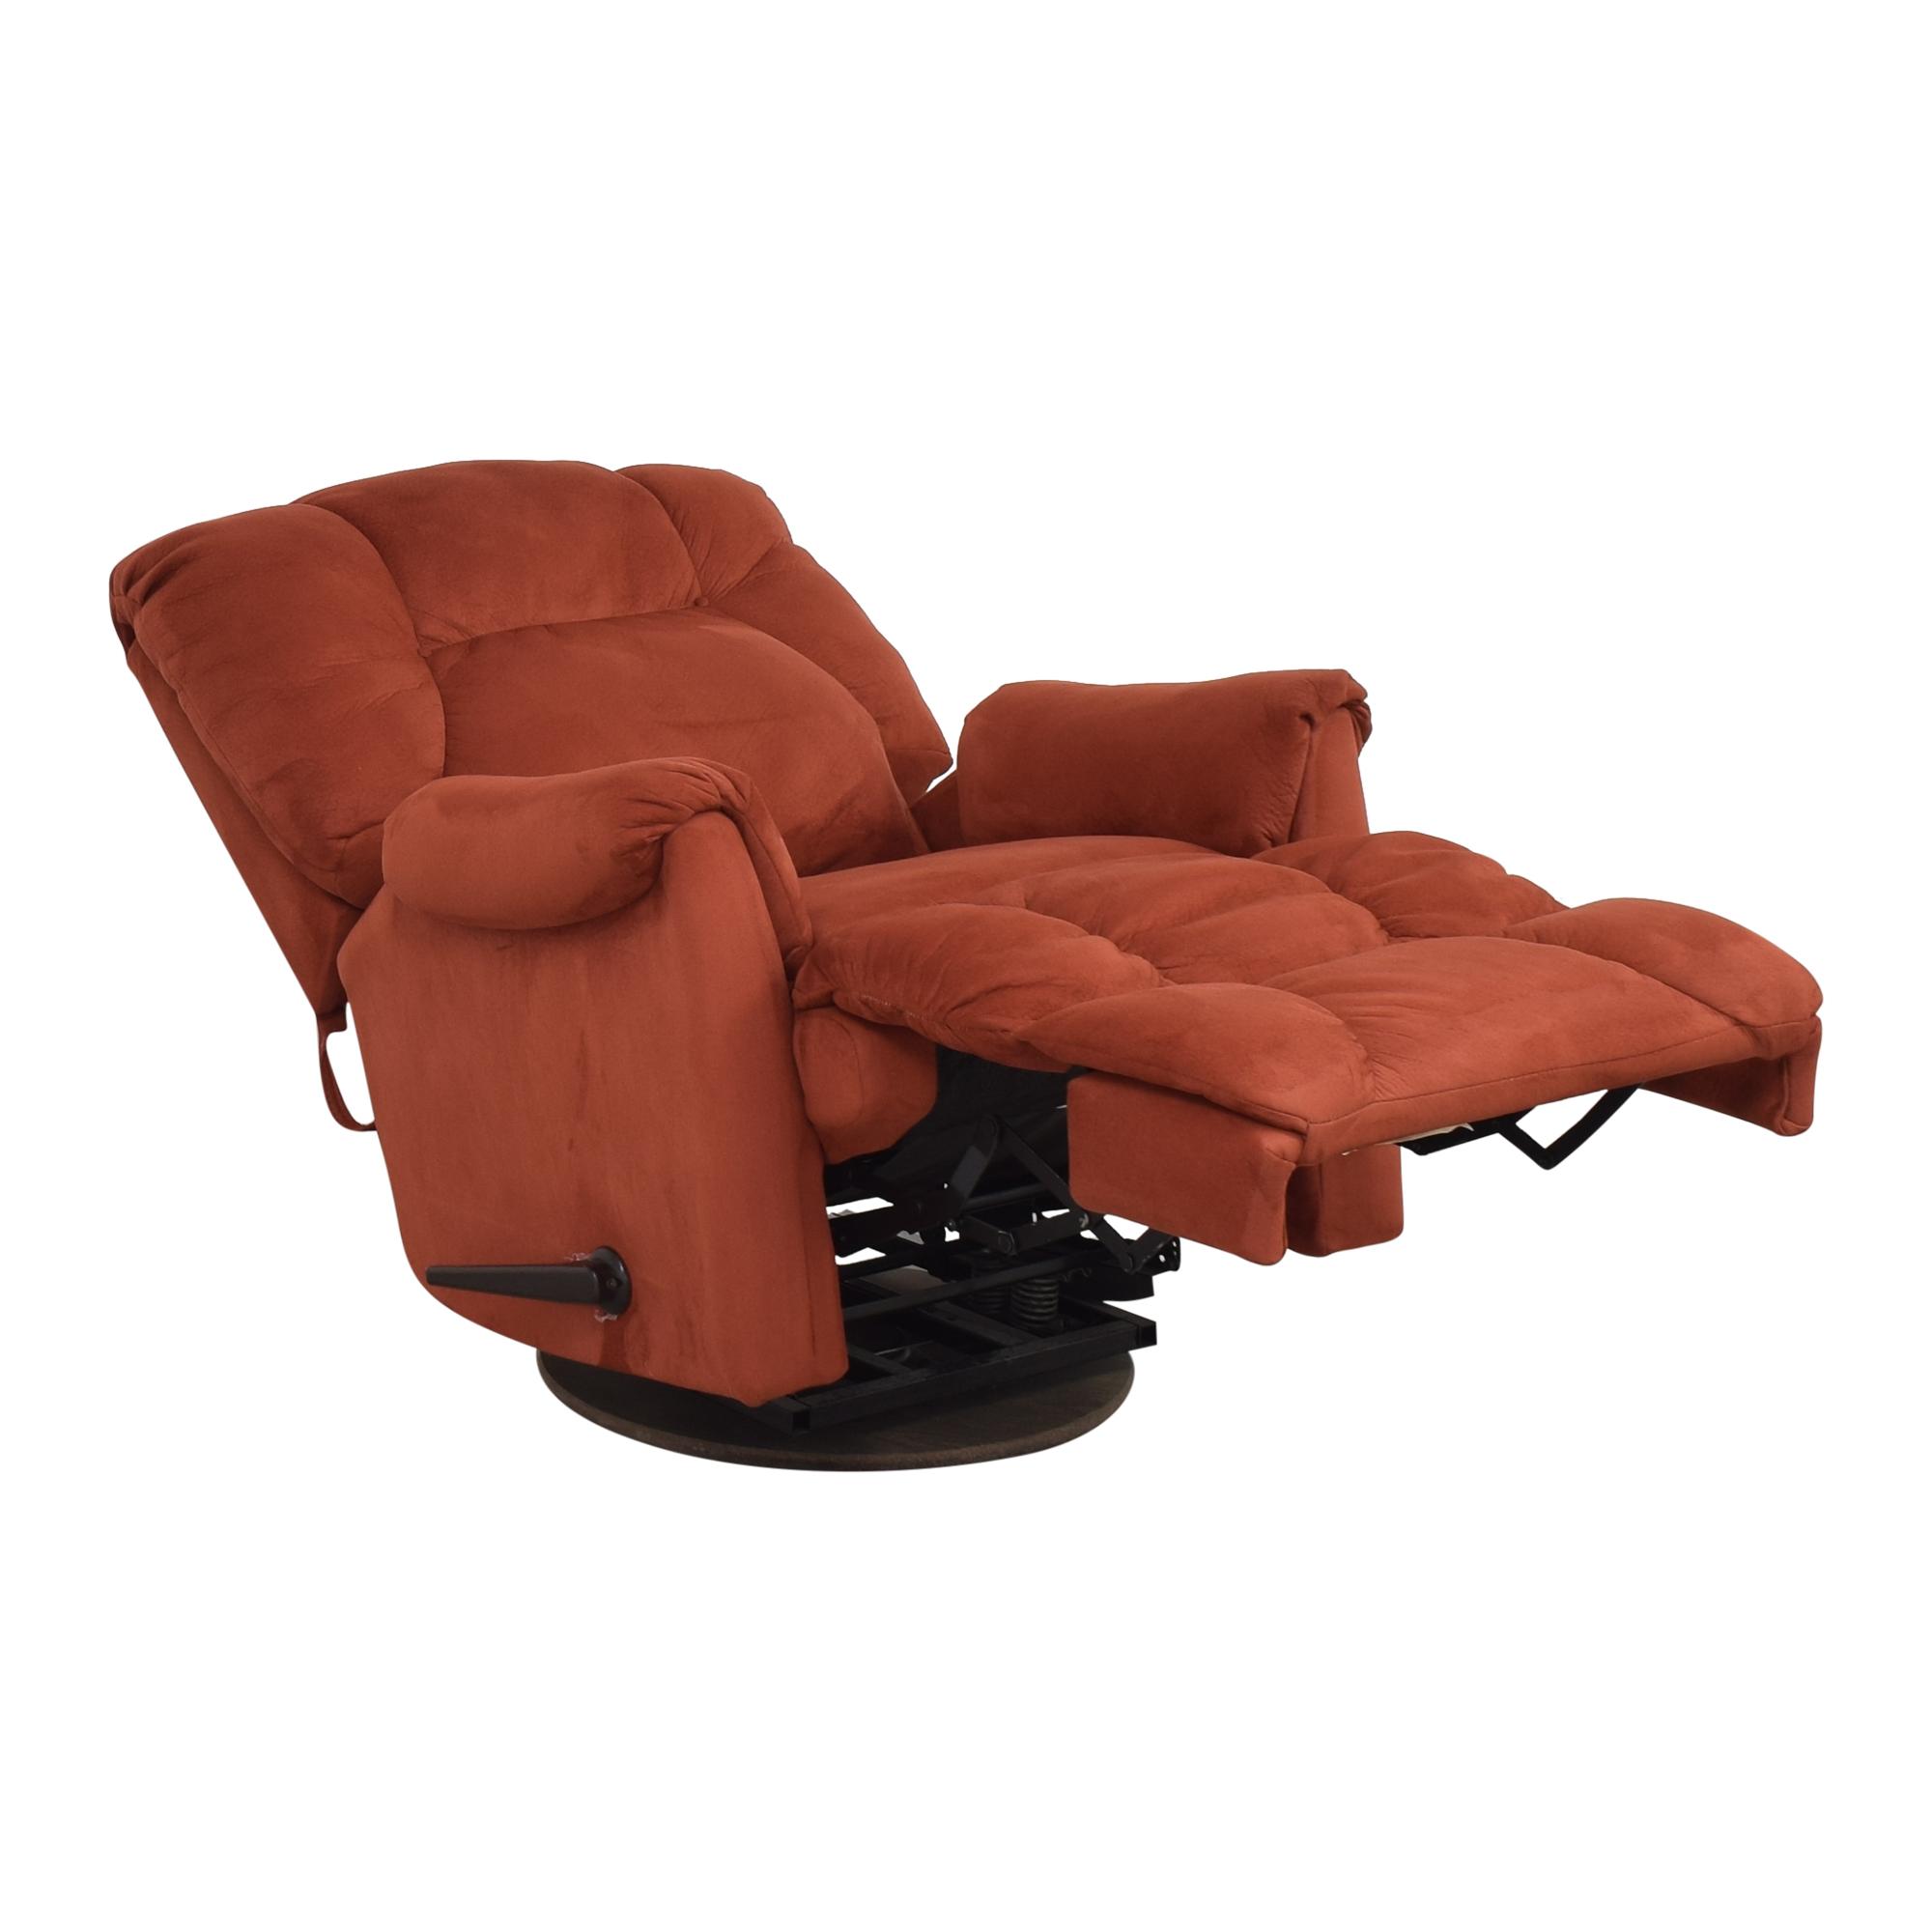 Lane Furniture Lane Furniture Recliner Chair ma